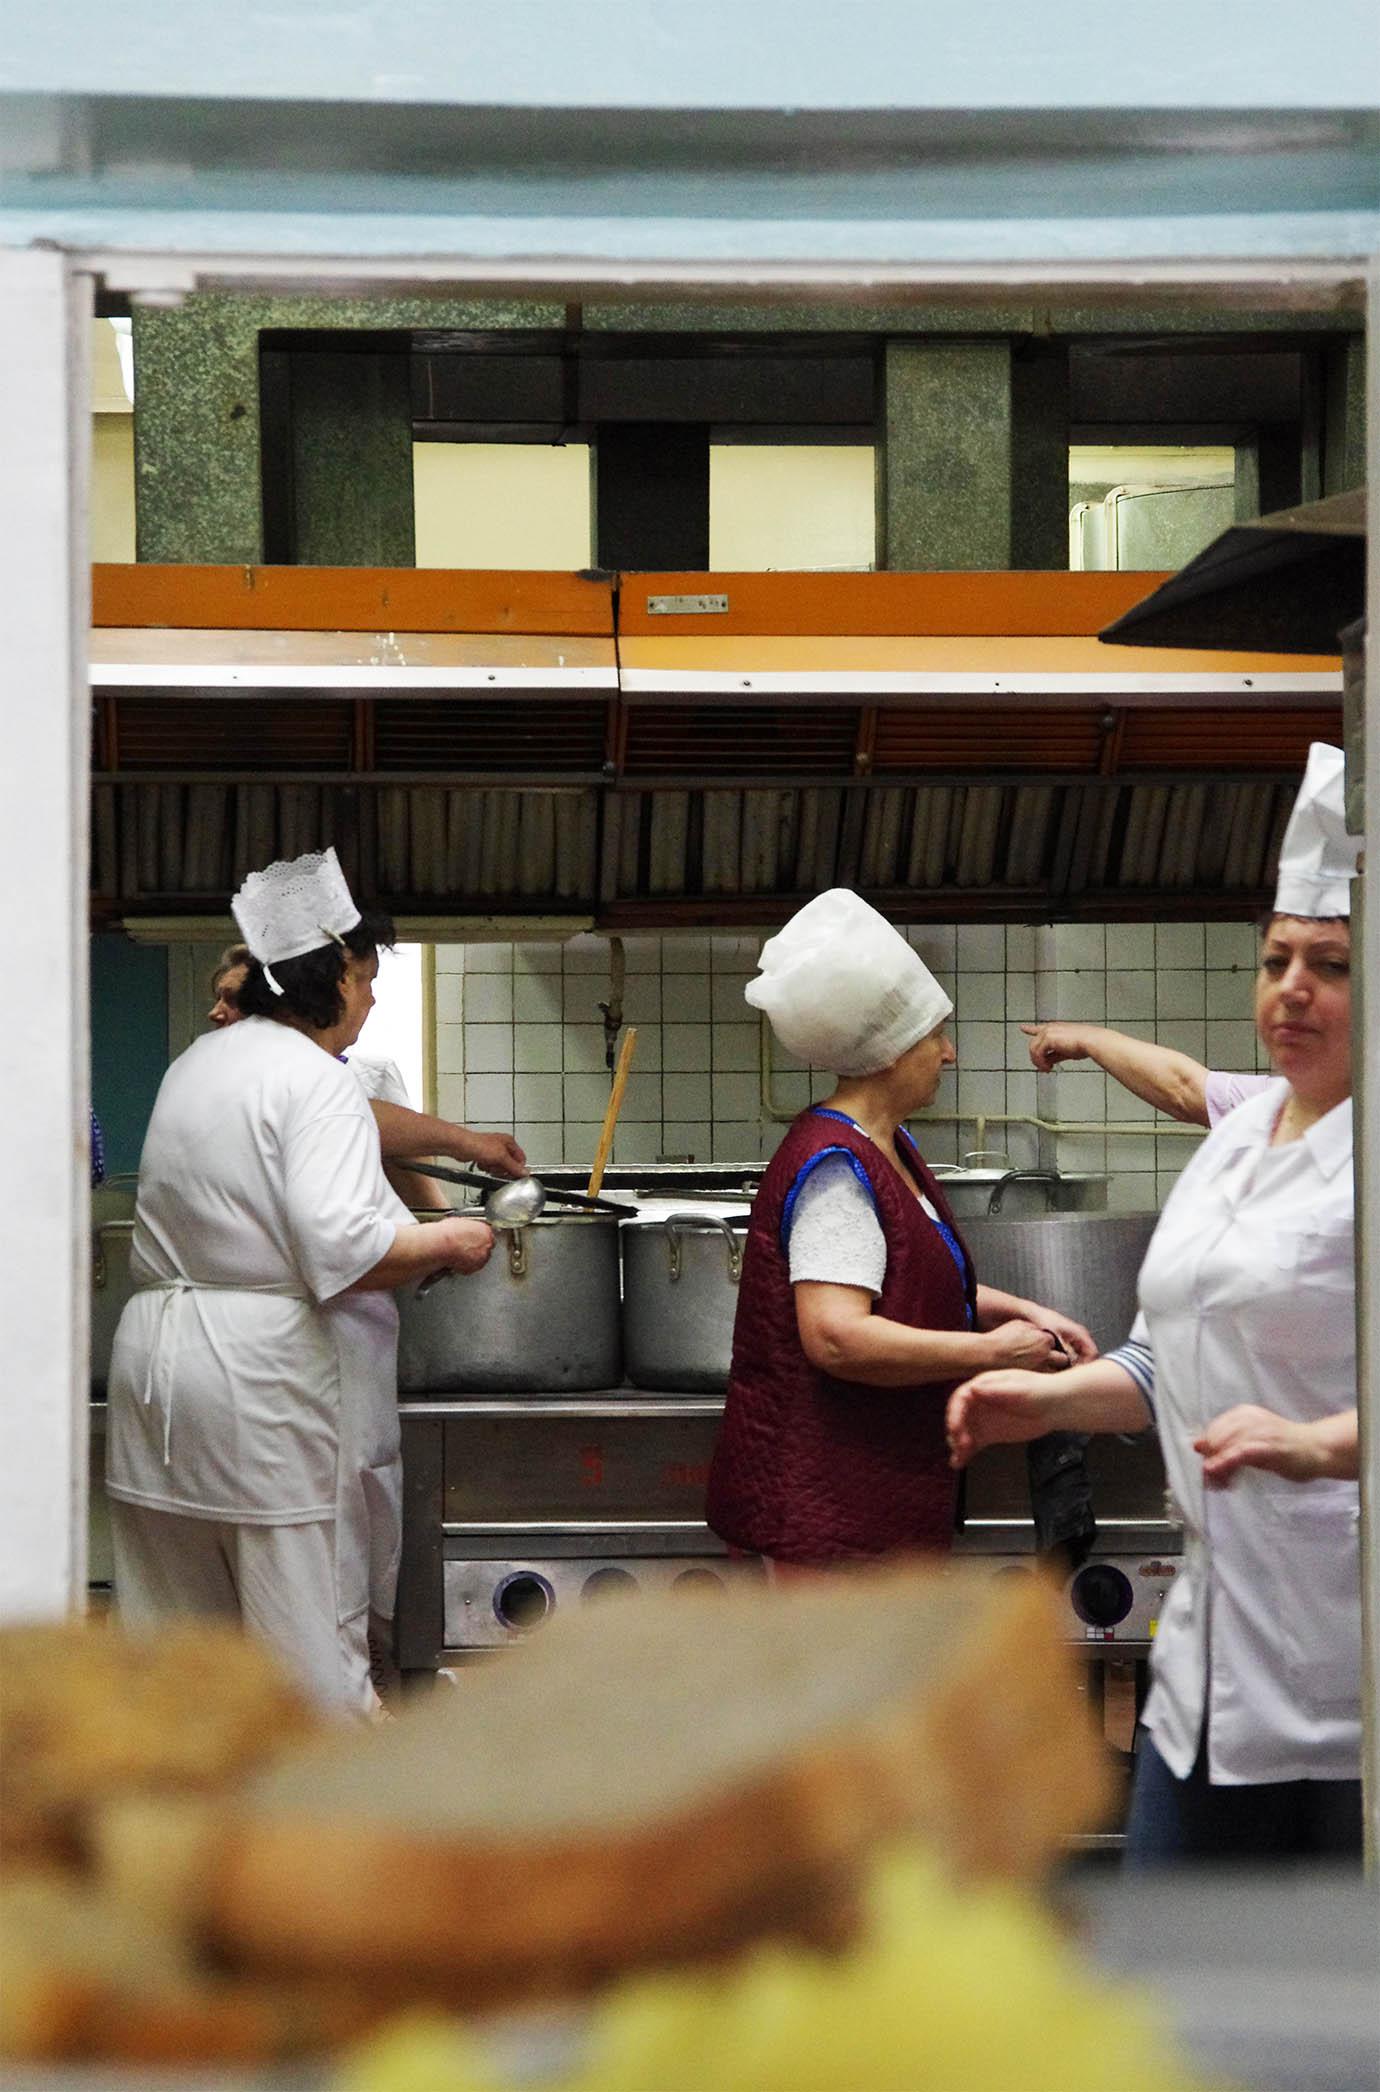 chernobyl-cafeteria83